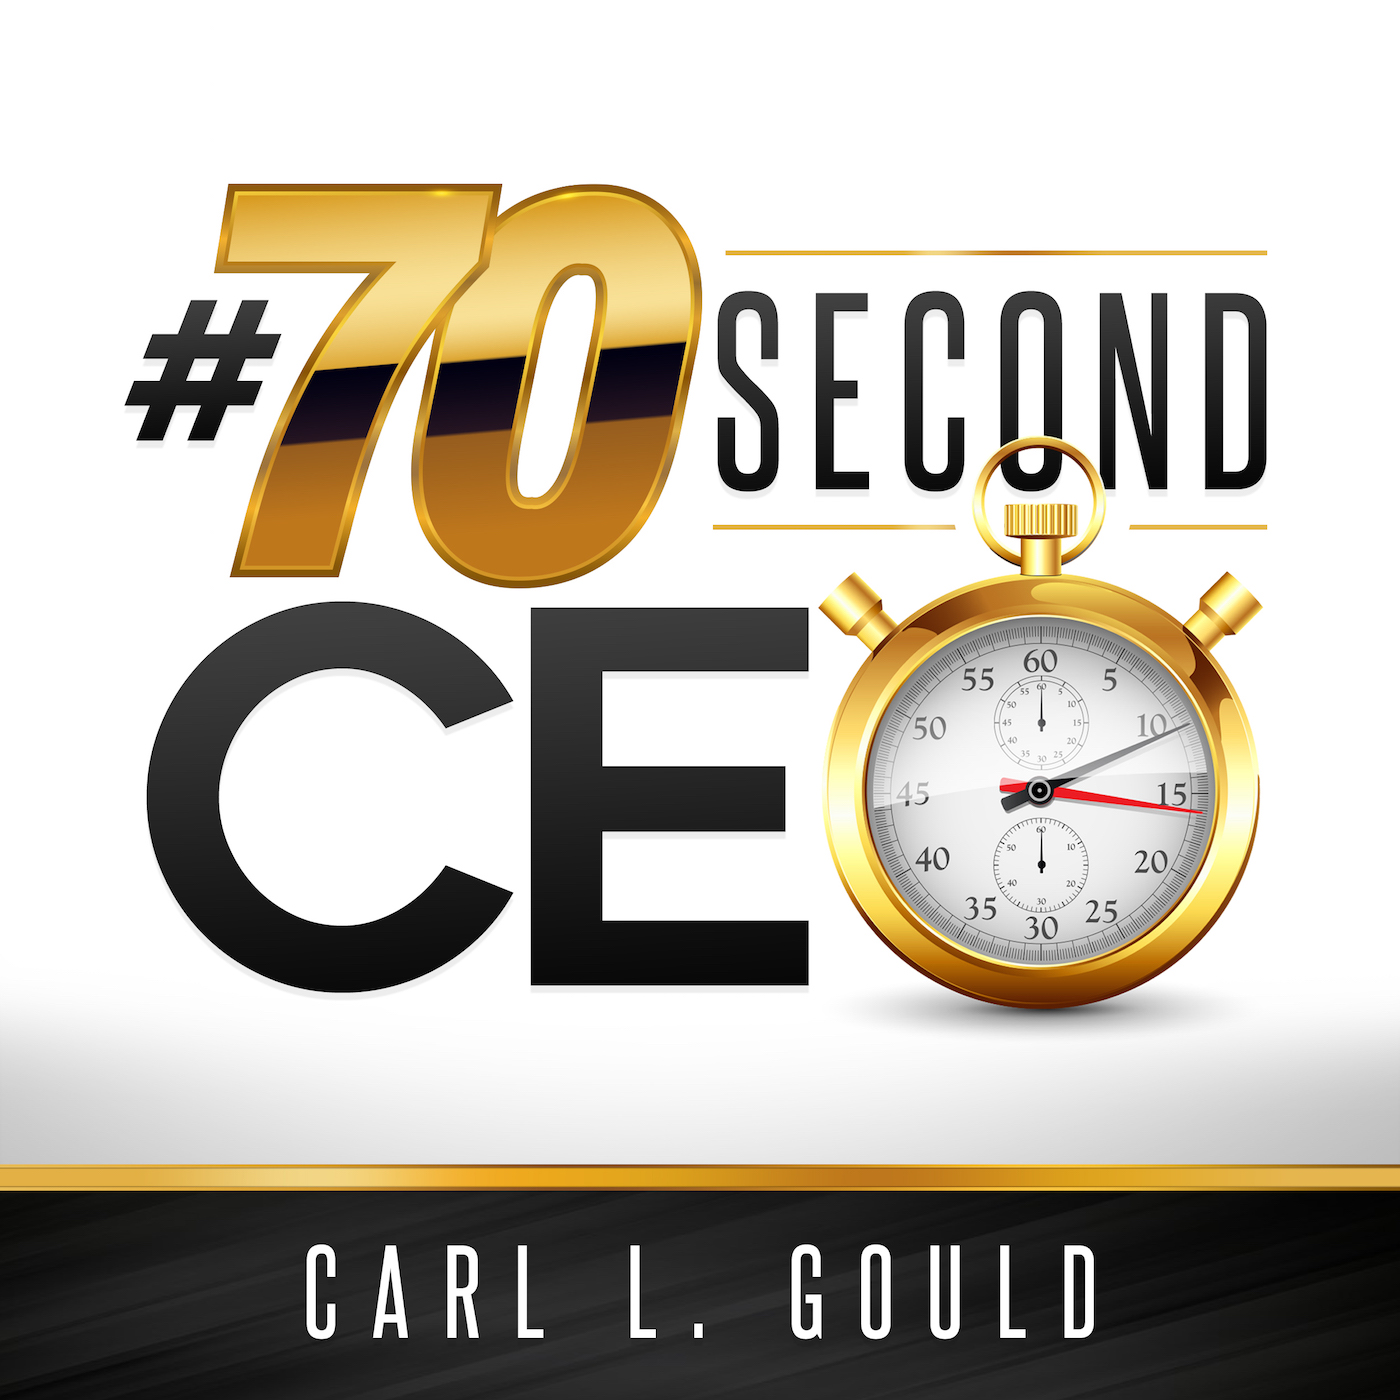 CarlGould-#70secondCEO-Train Train Train!